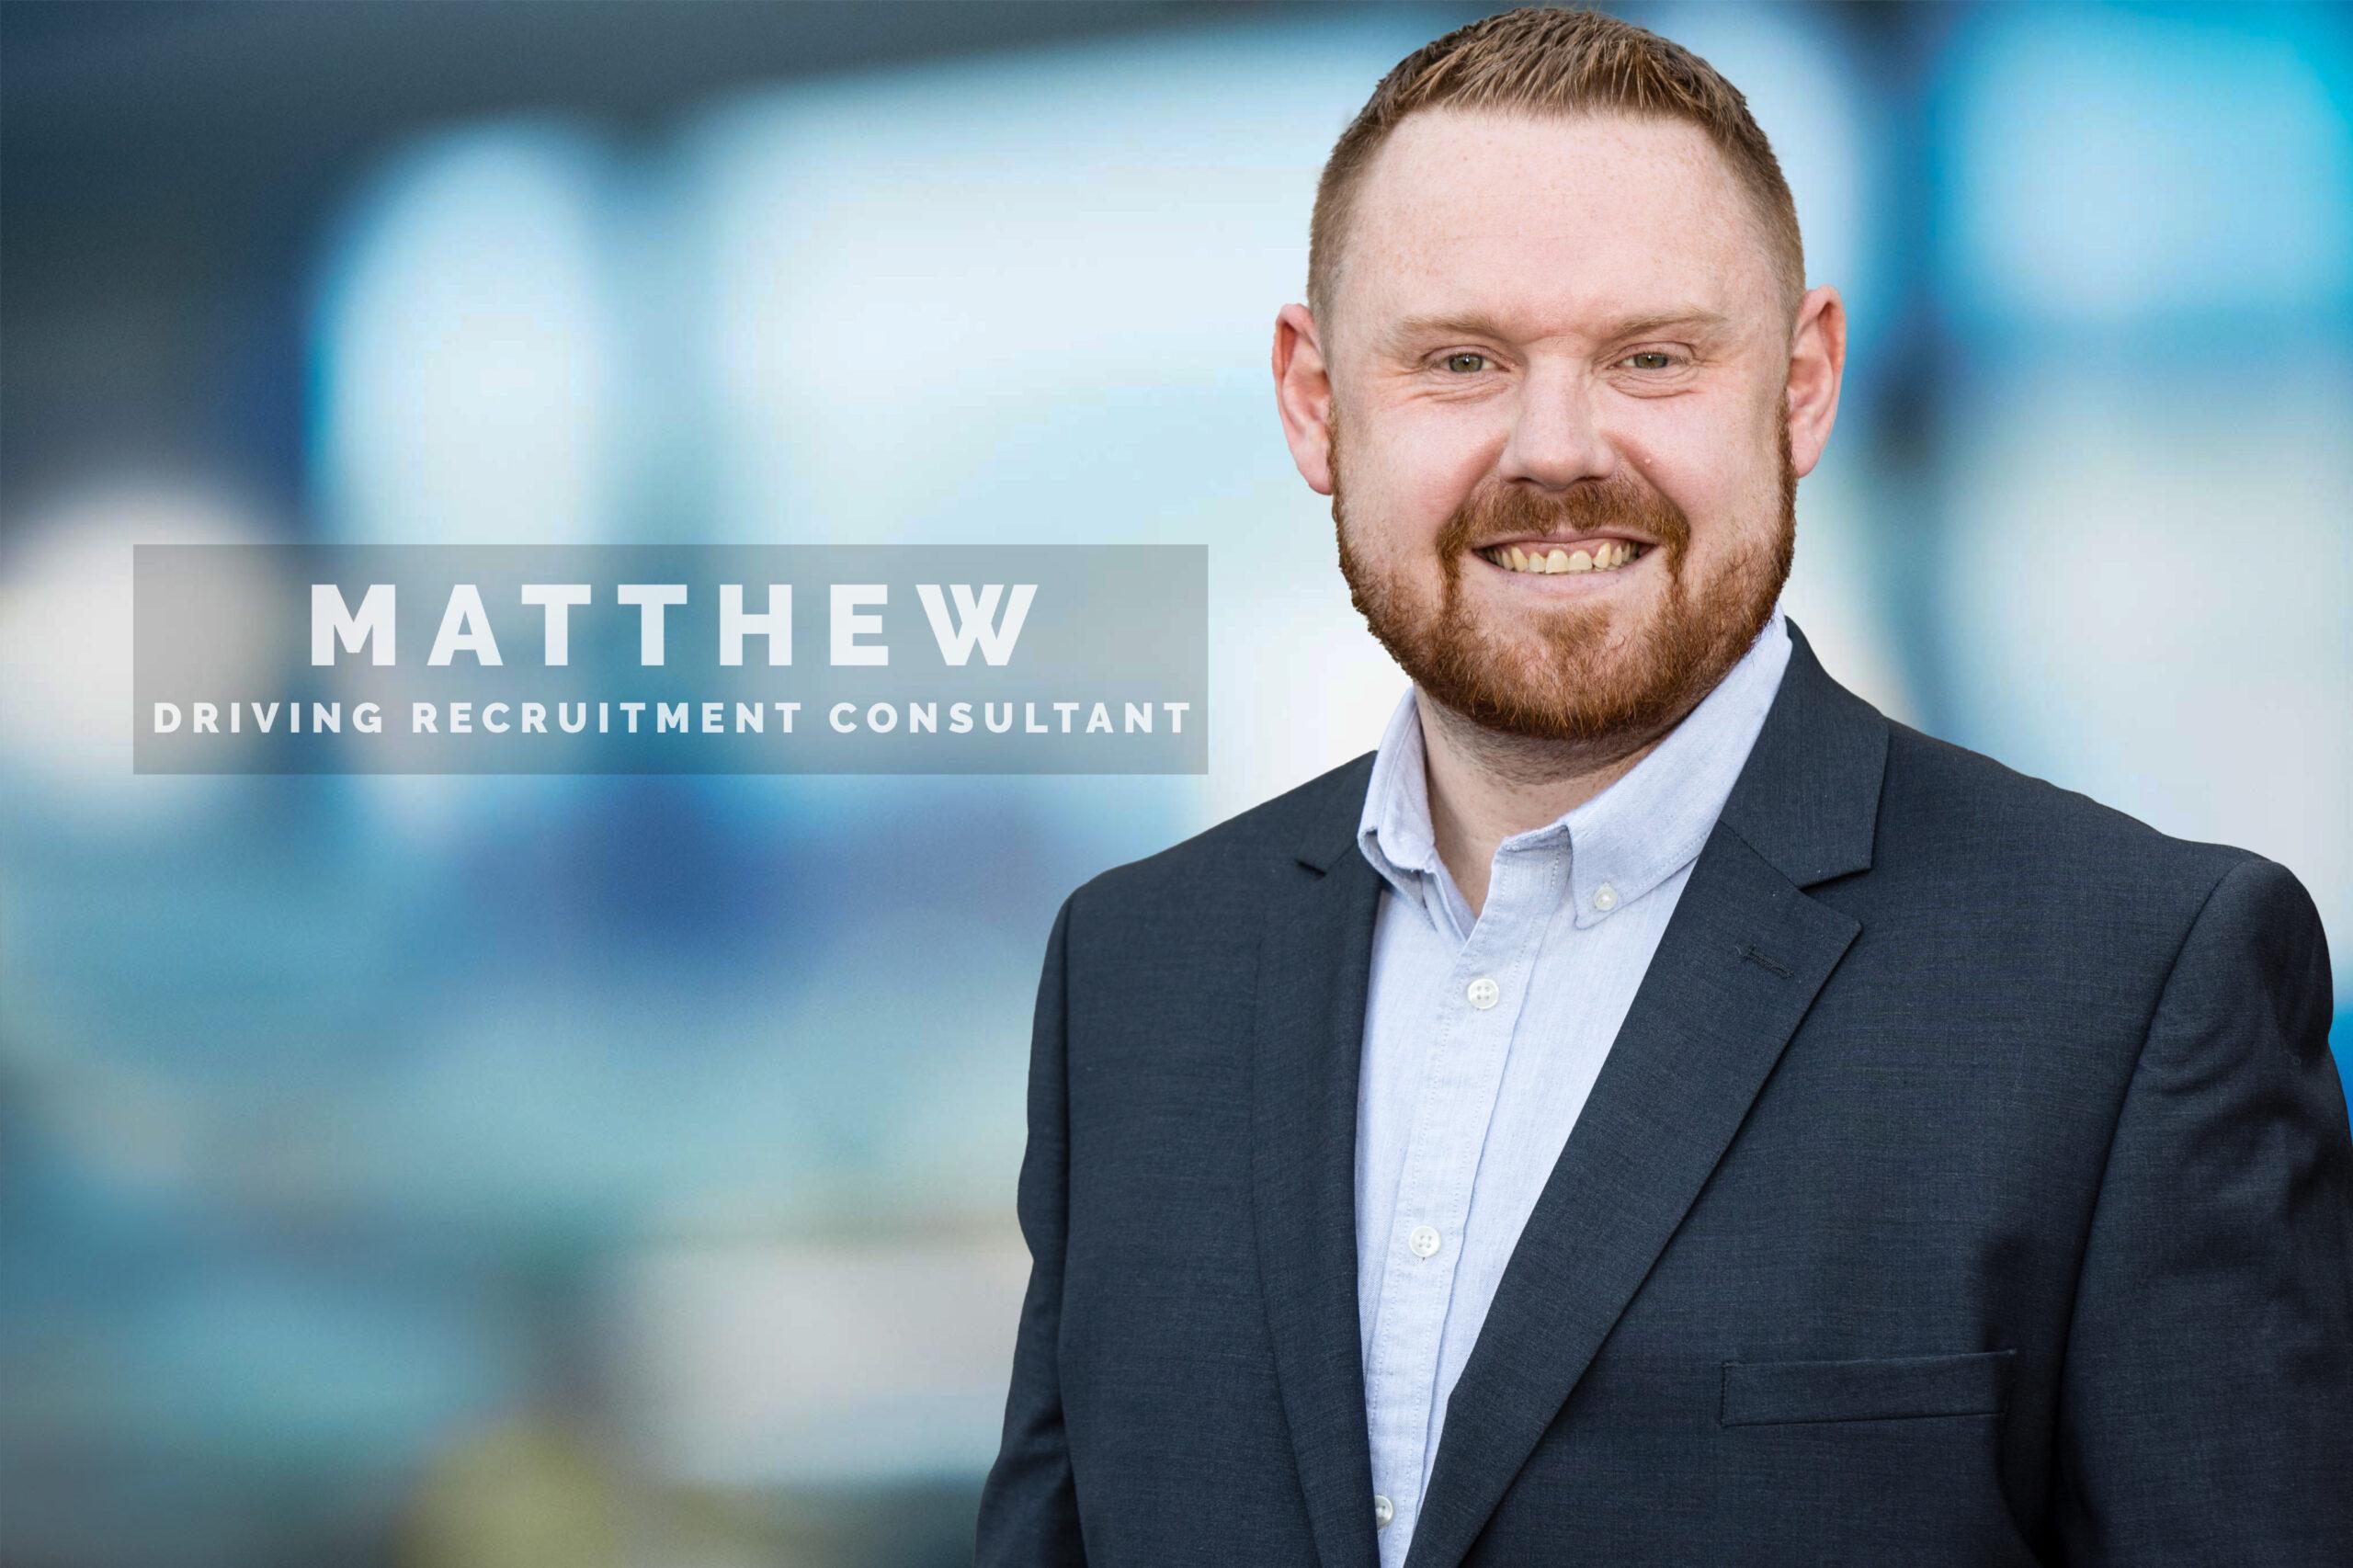 Matthew - Driving Recruitment Consultant